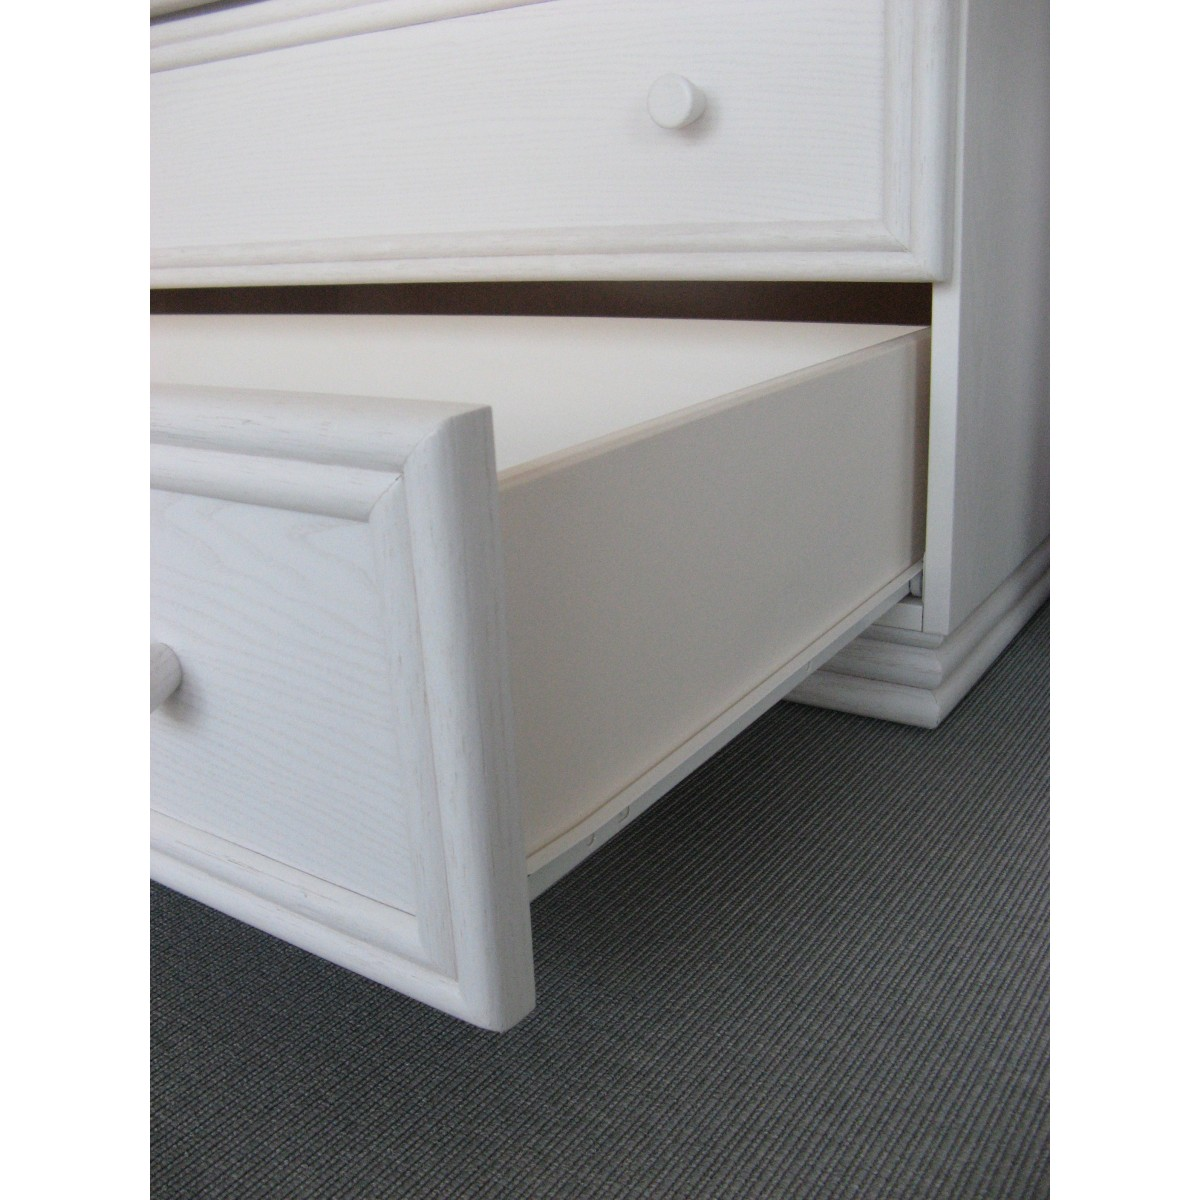 armoire en rotin 2 portes. Black Bedroom Furniture Sets. Home Design Ideas